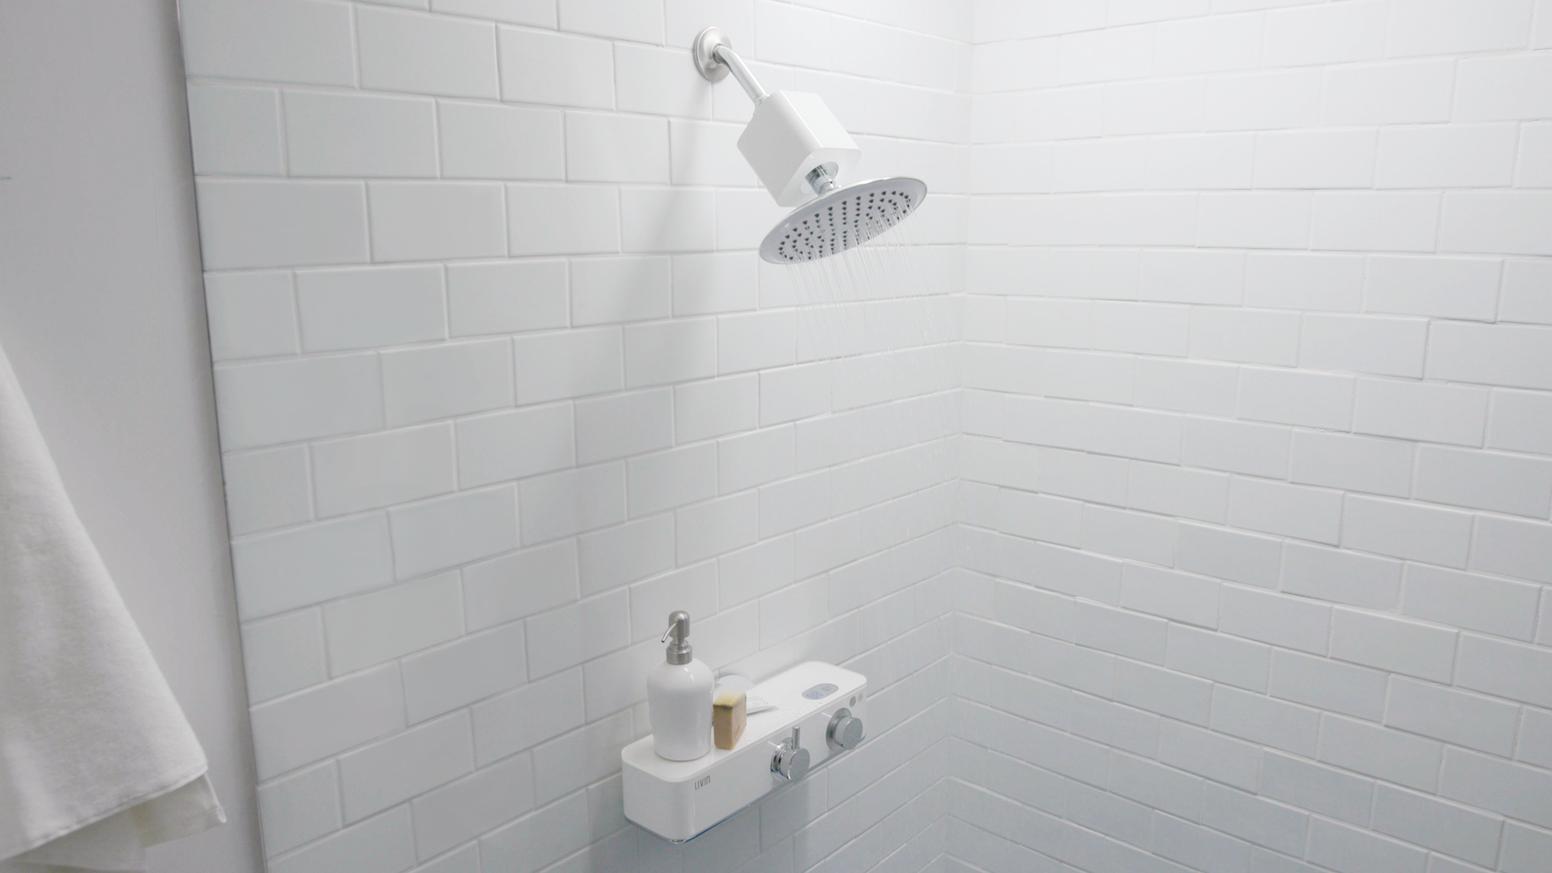 Livin - Shower, redesigned in a smart way. by Livin — Kickstarter